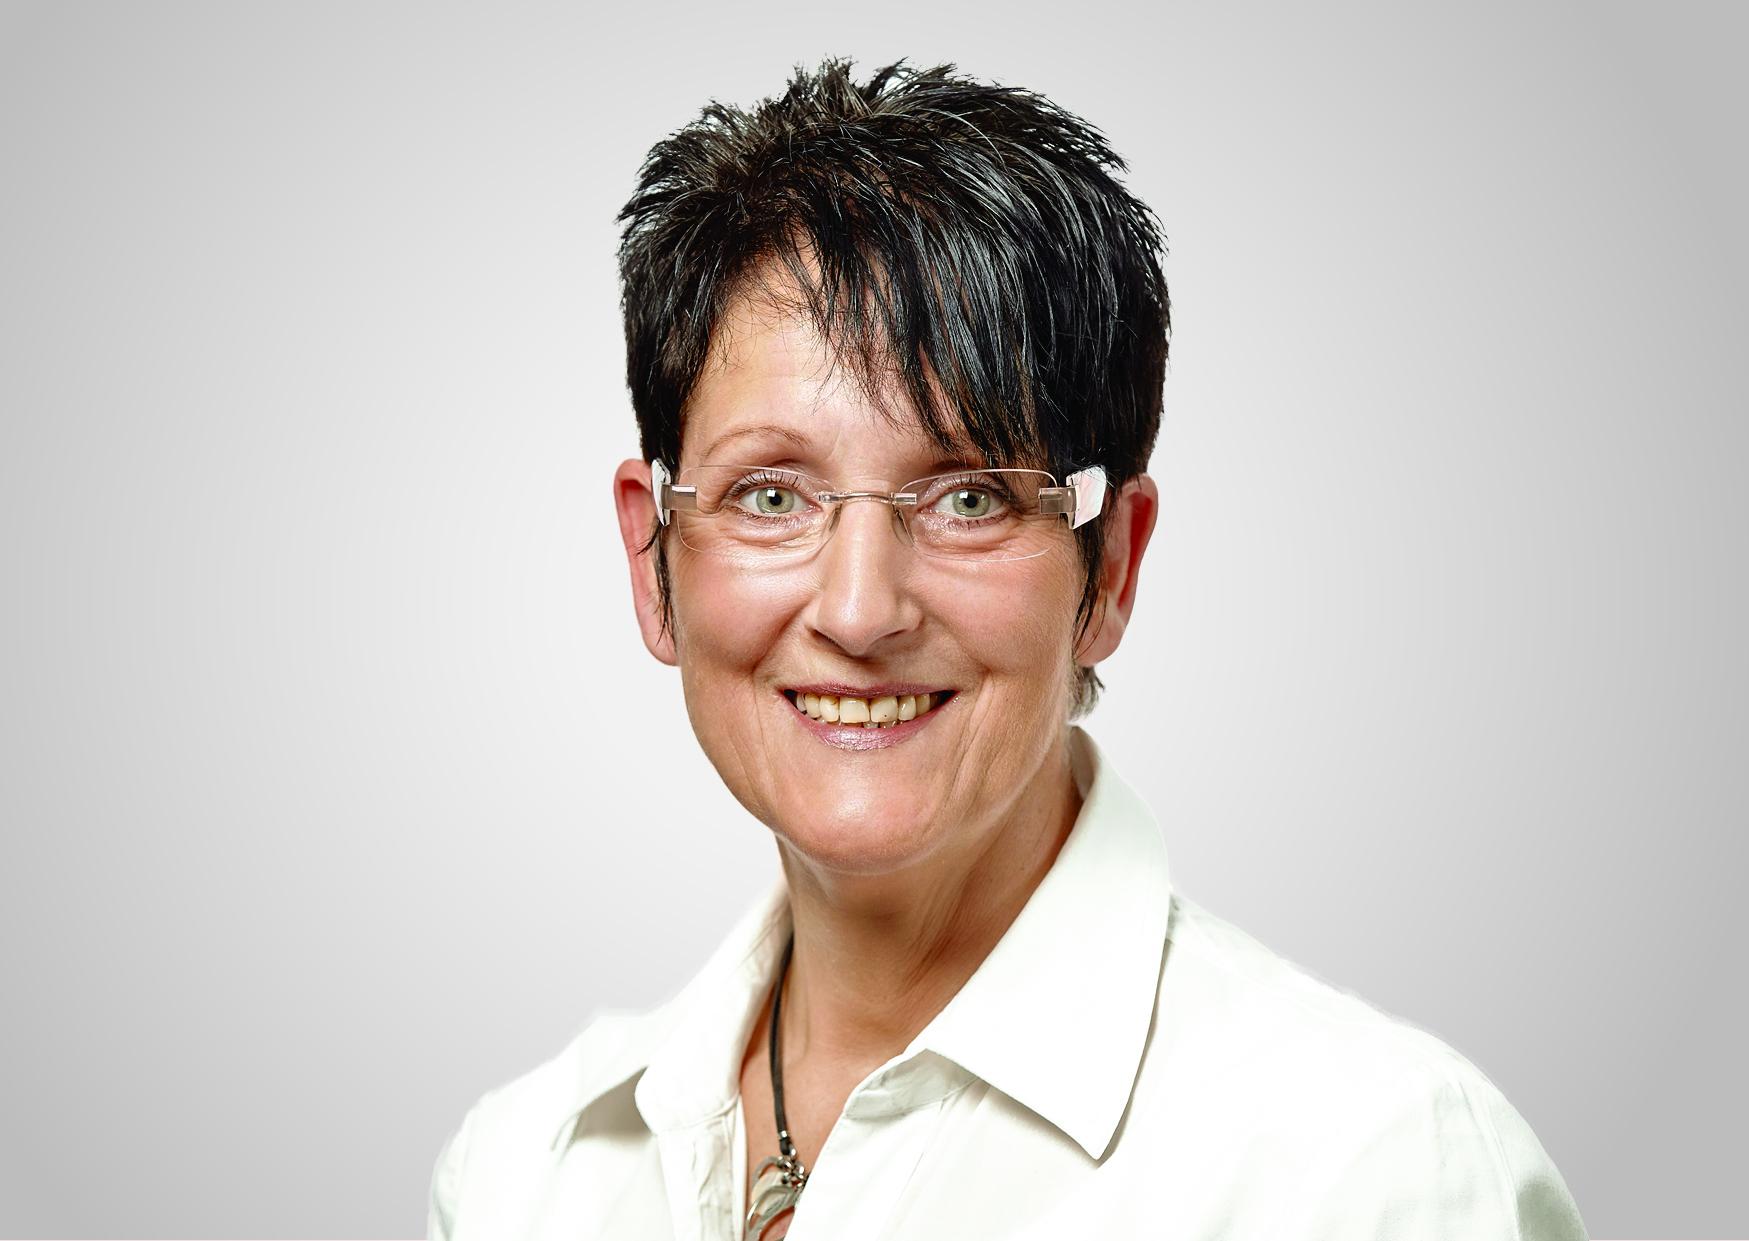 Marion Nentwig